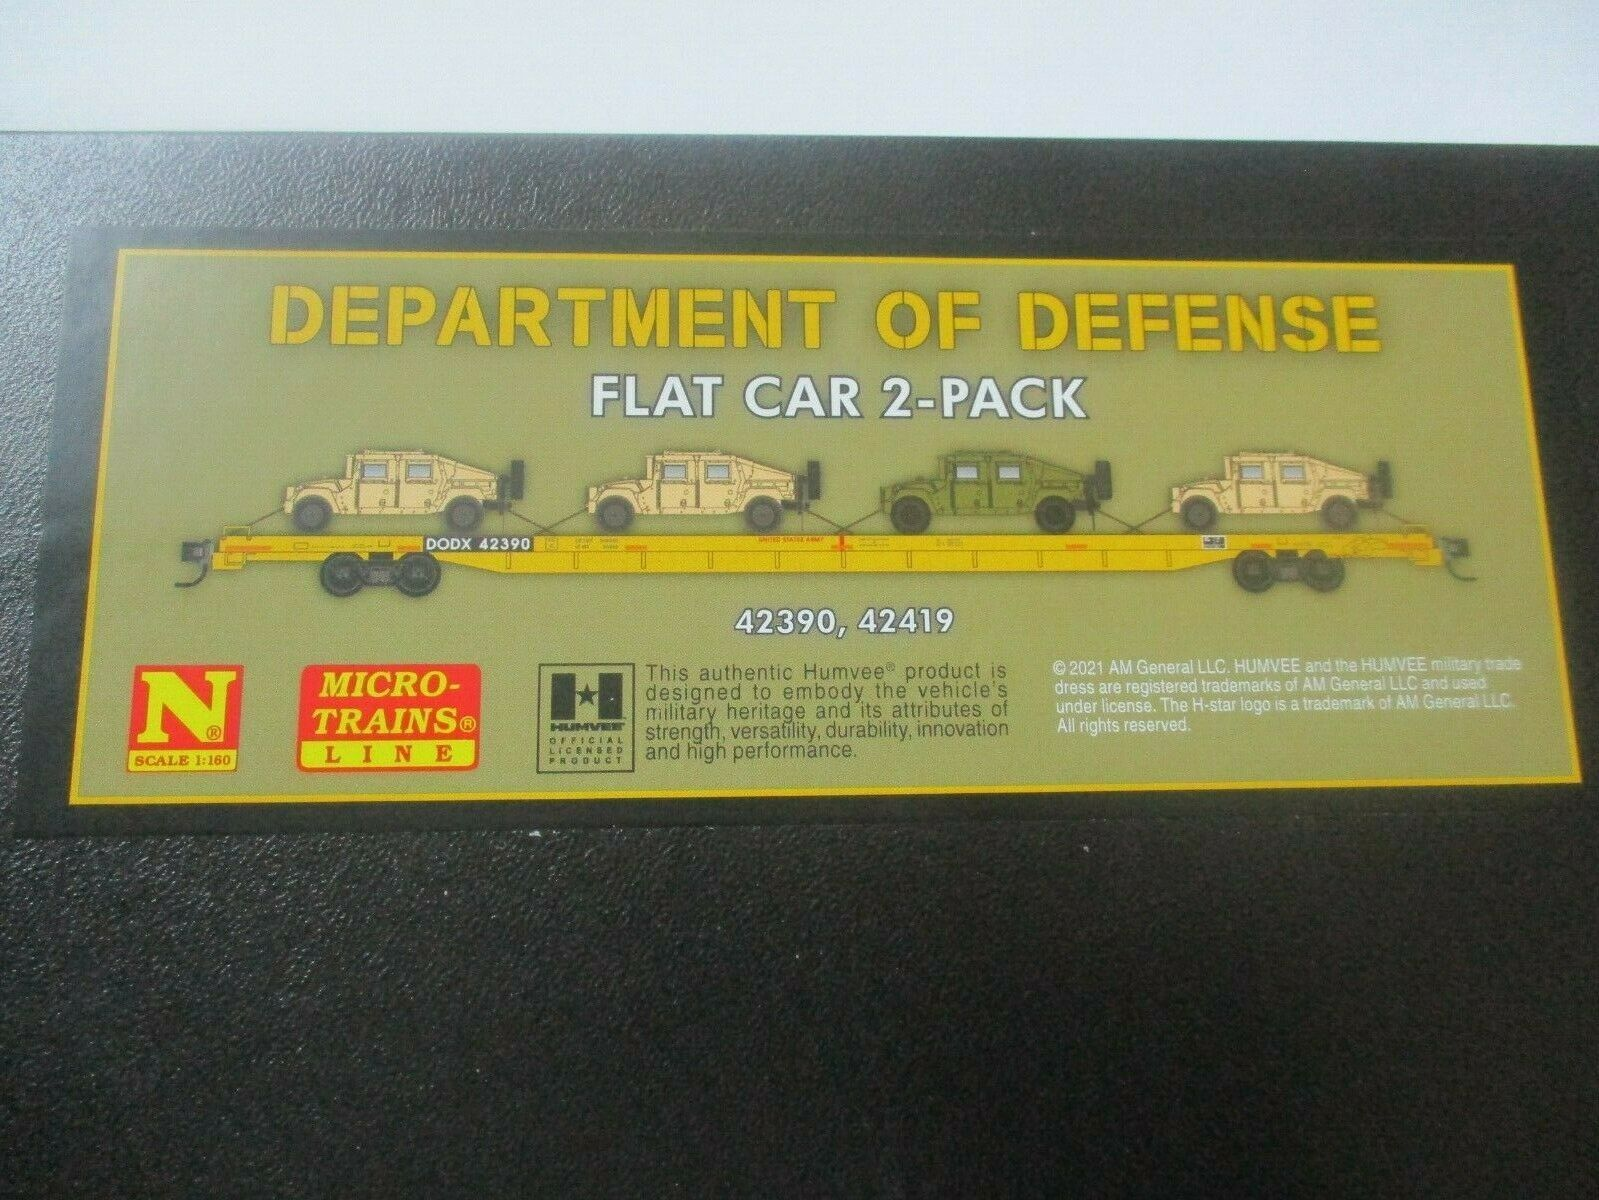 Micro-Trains # 99302180 Department of Defense Flat Car 2 Pack w/Humvees N-Scale